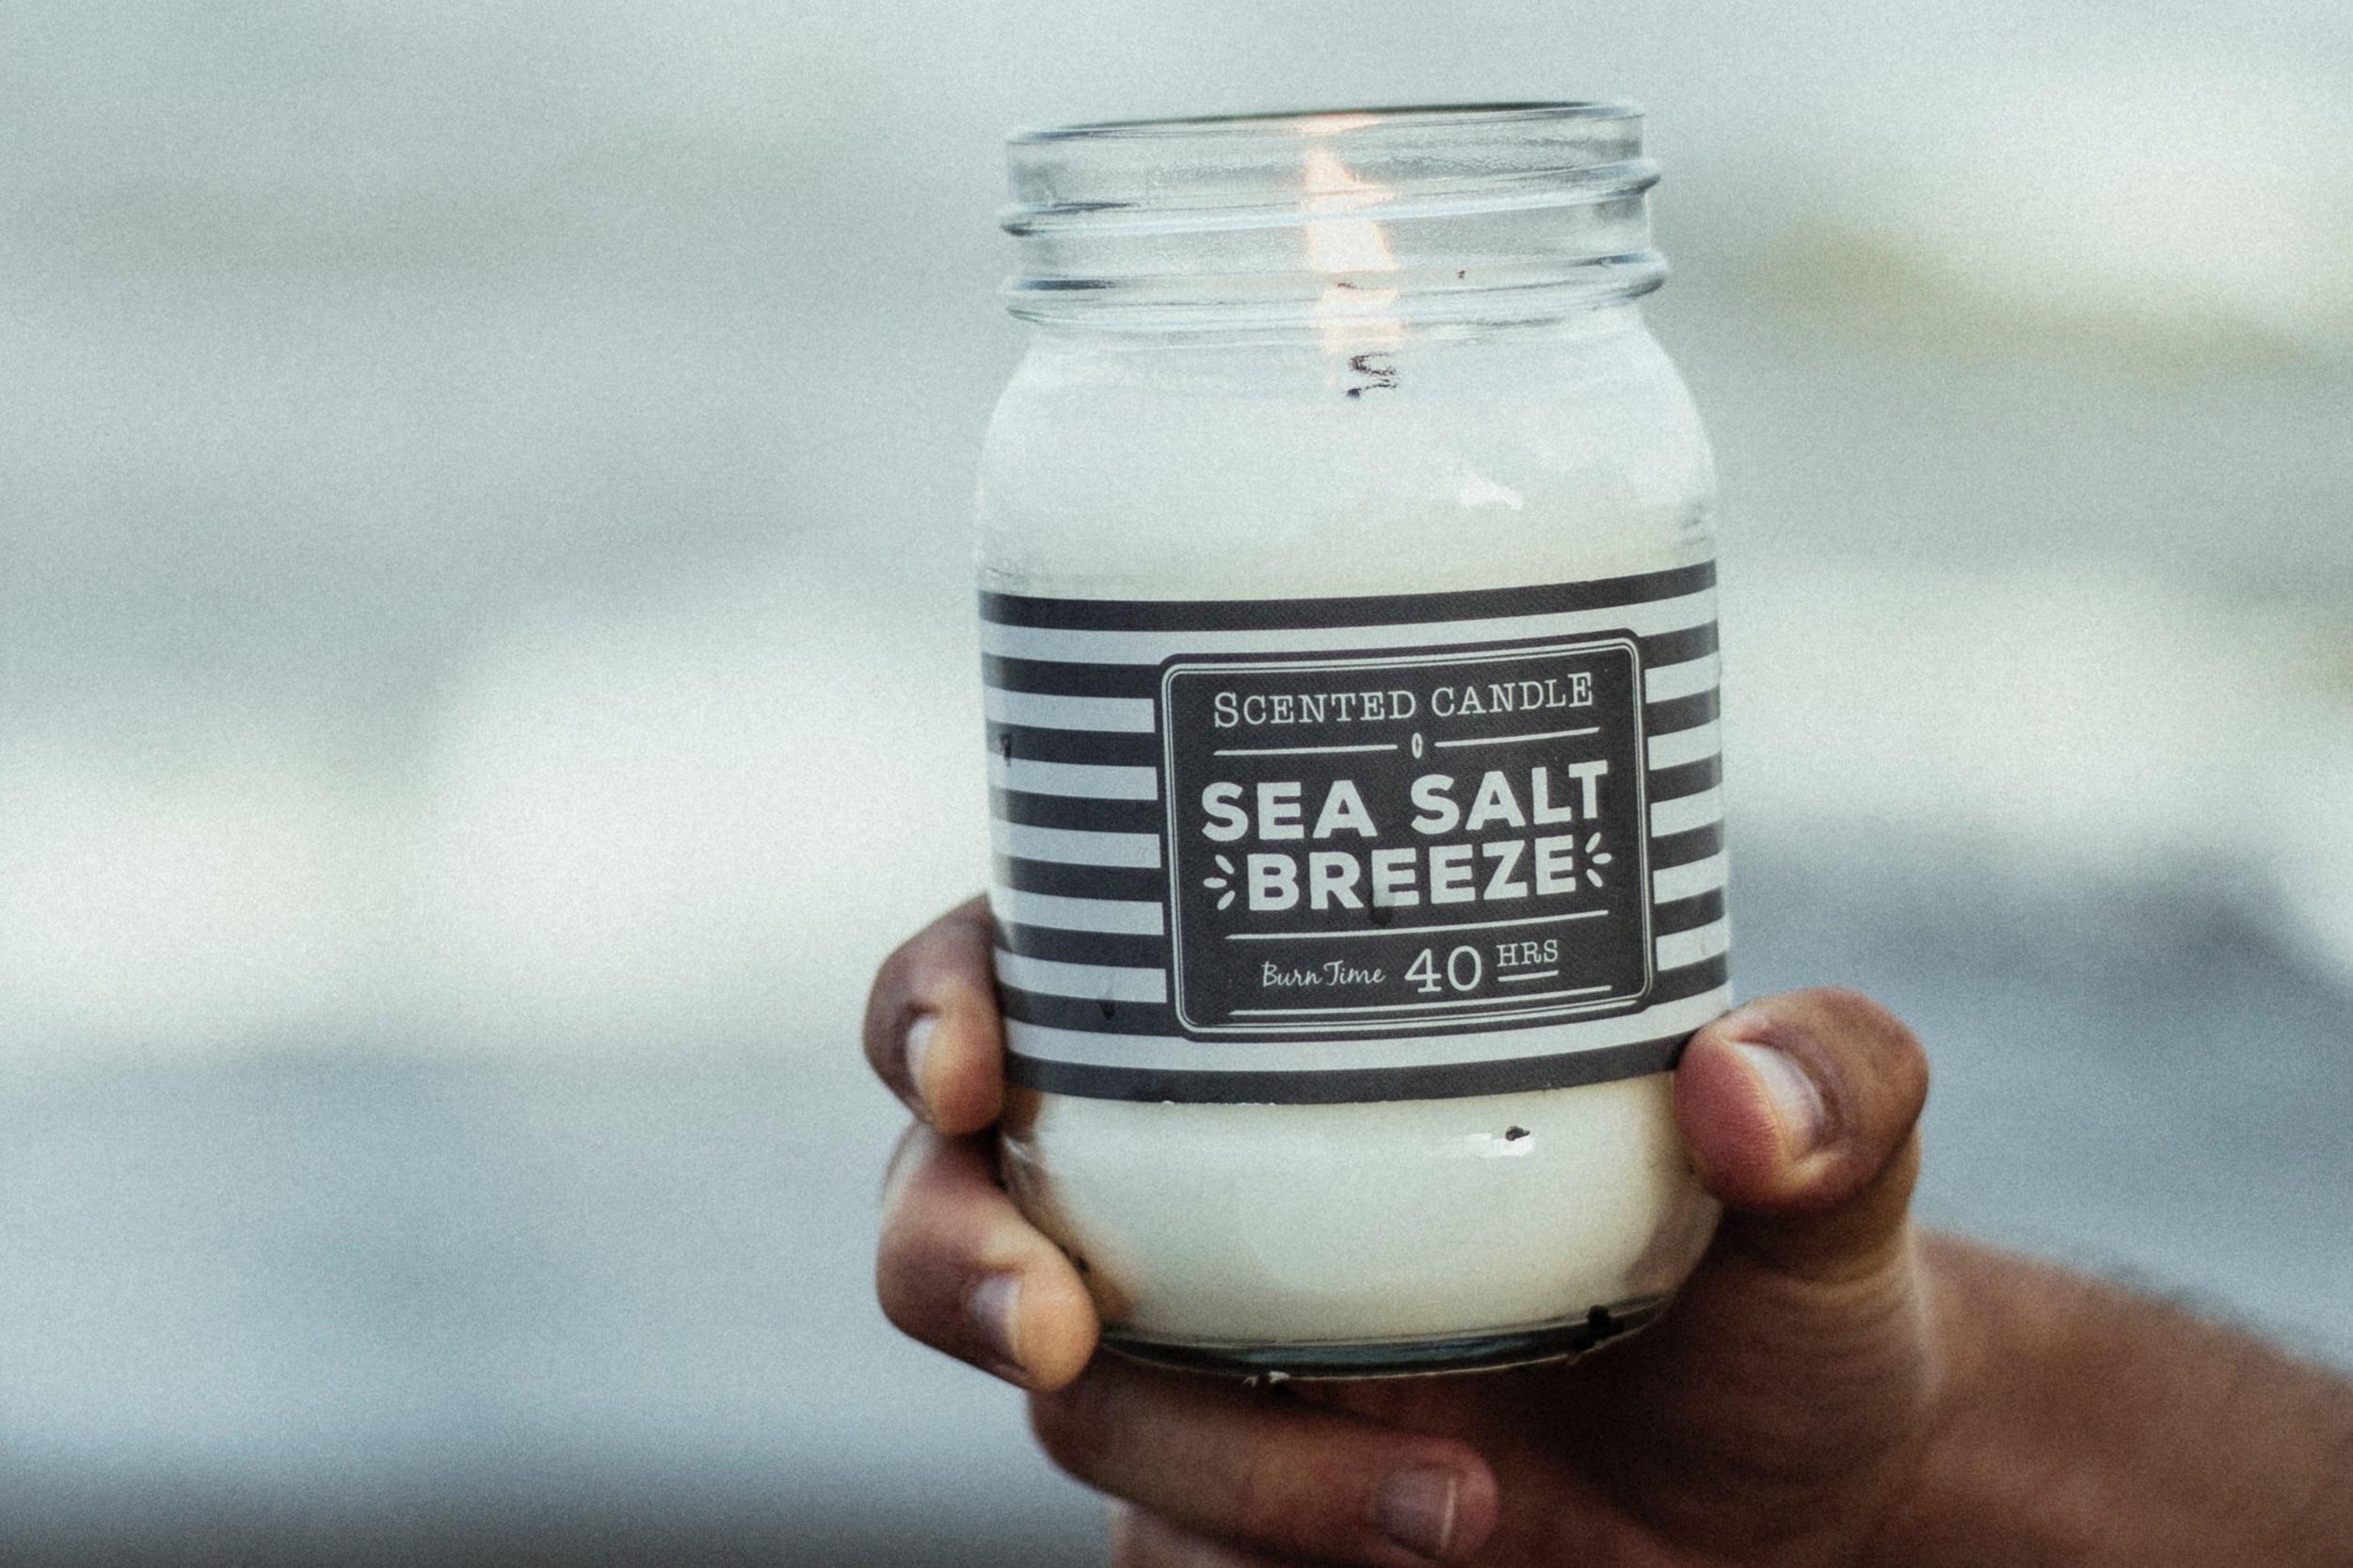 blur-candle-candle-jar-564906.jpg